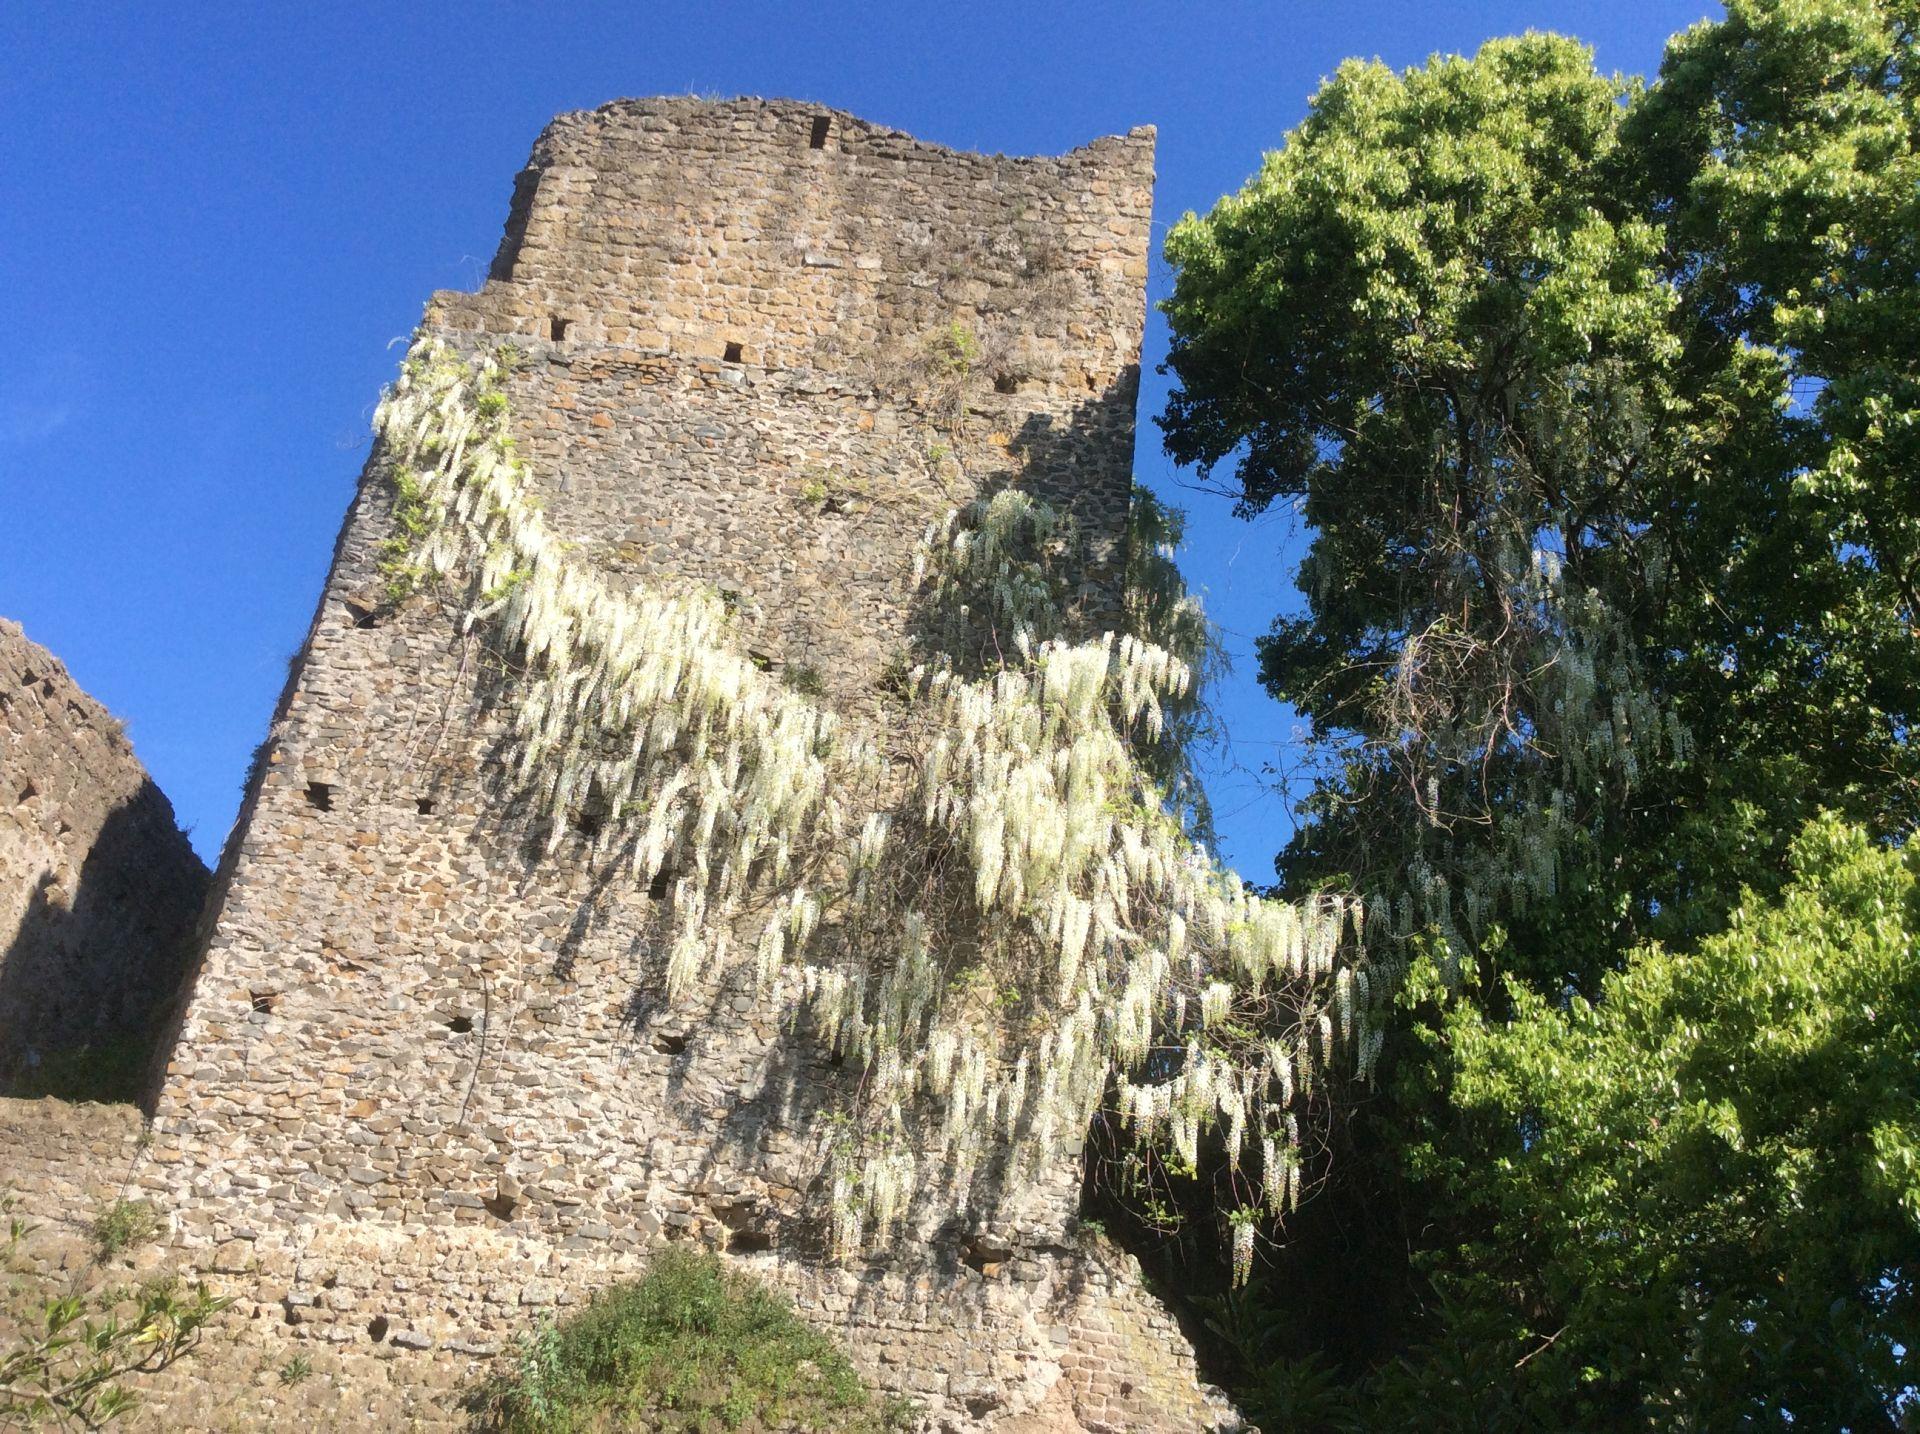 Torrechia